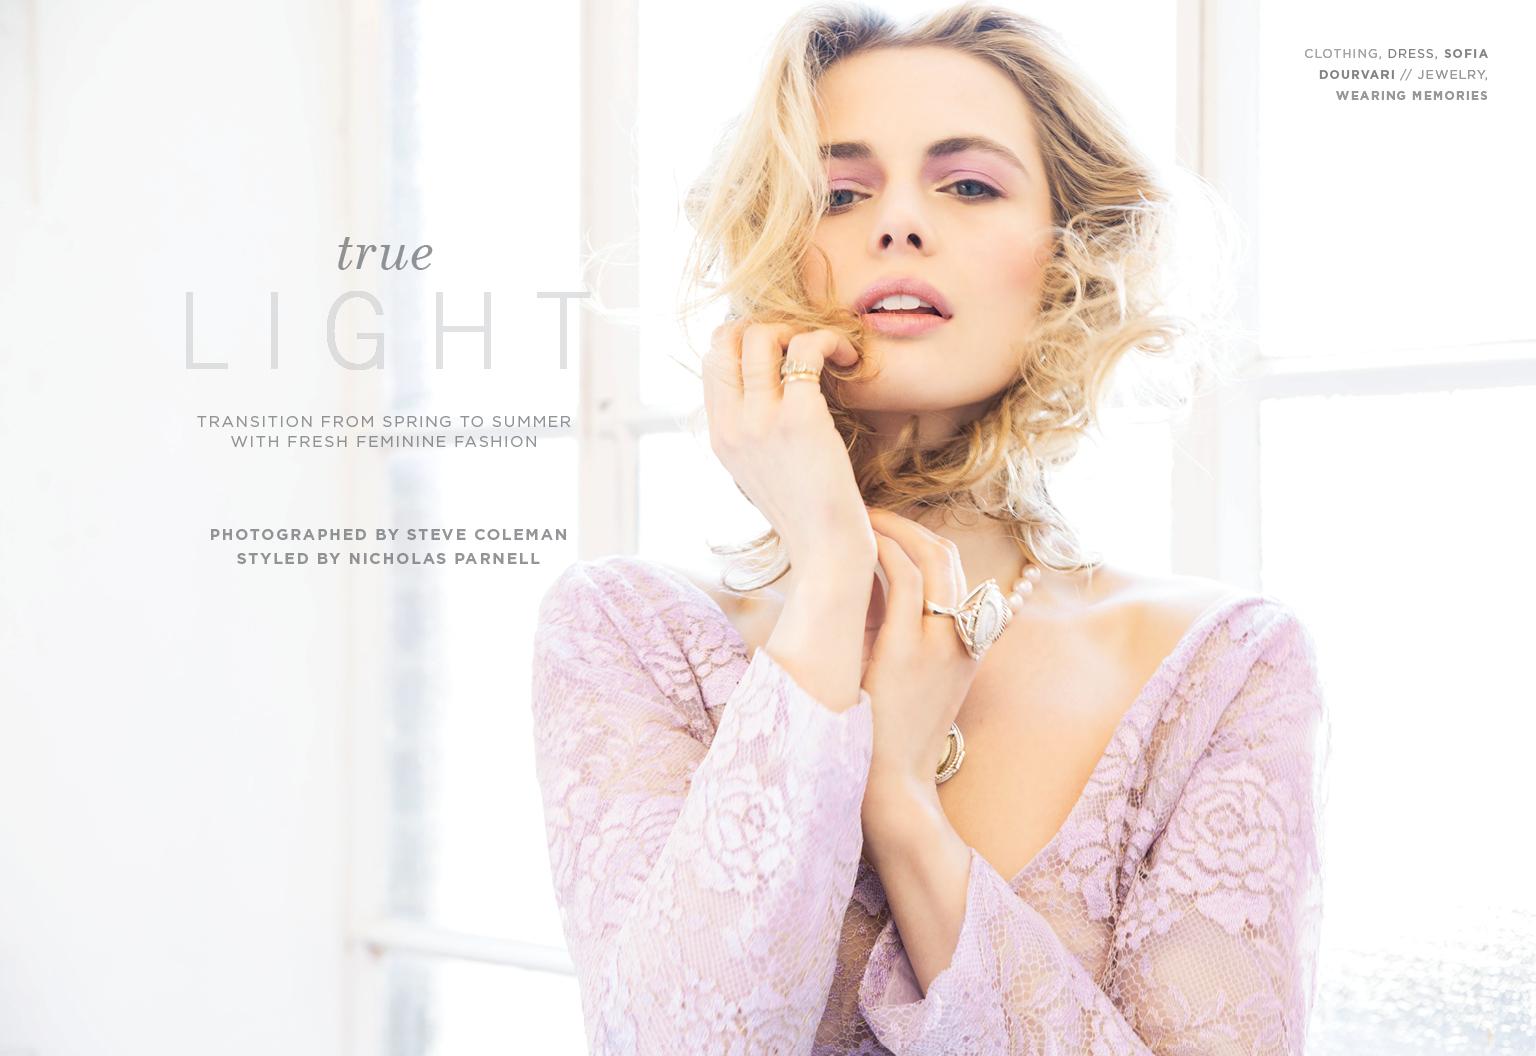 Style Magazine With Sofia Dourvari